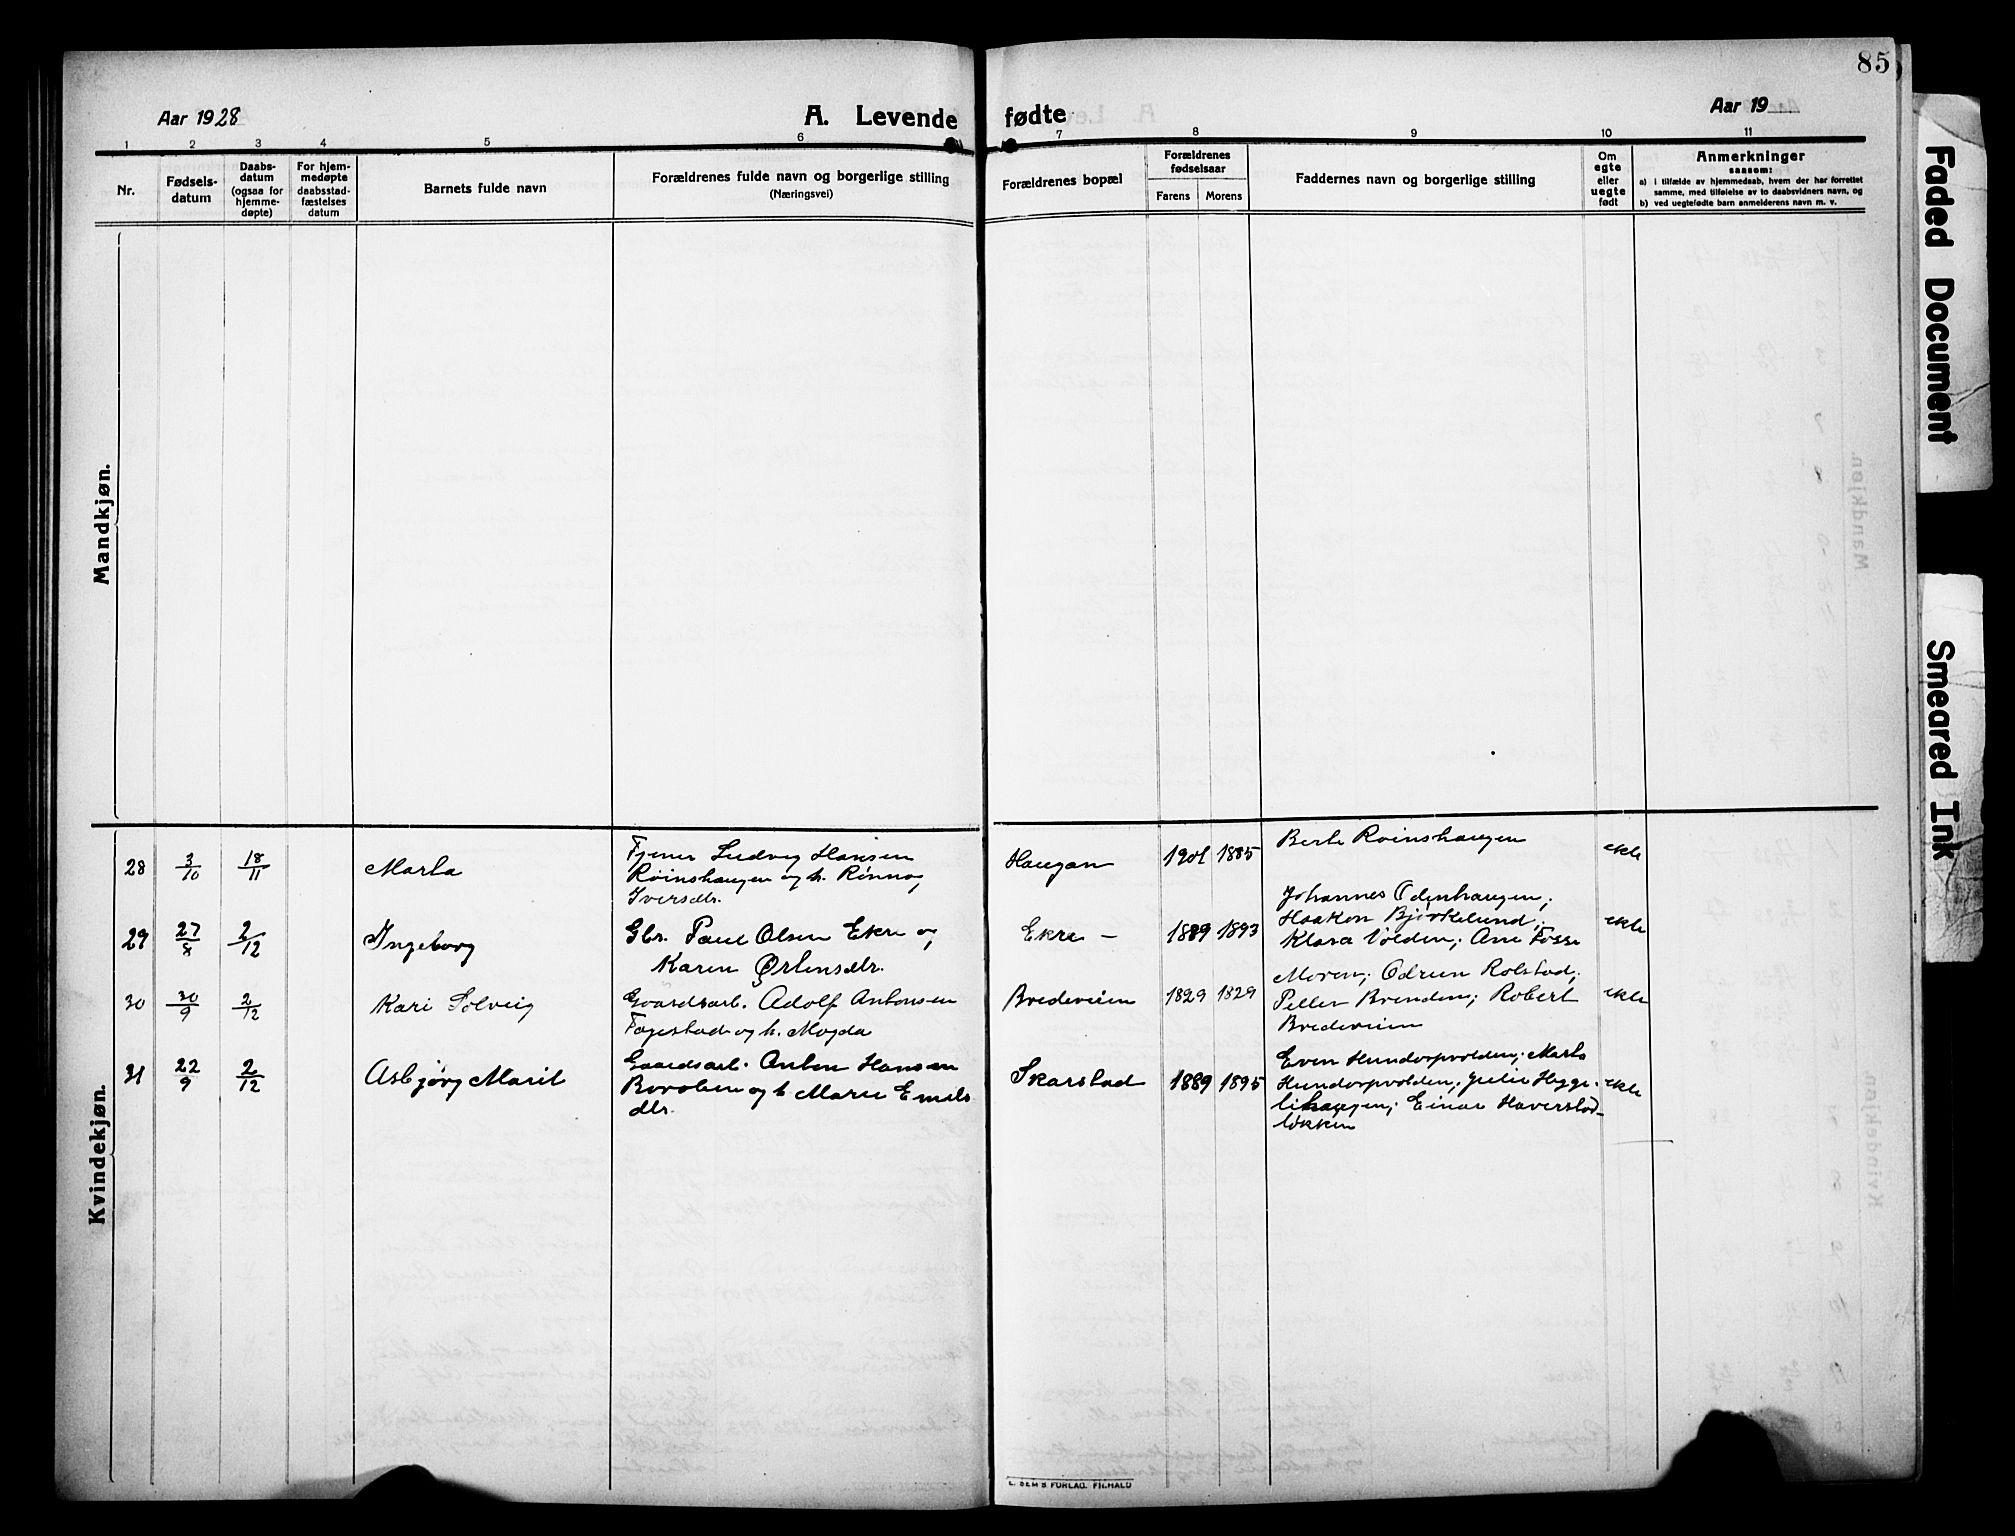 SAH, Sør-Fron prestekontor, H/Ha/Hab/L0005: Klokkerbok nr. 5, 1912-1930, s. 85